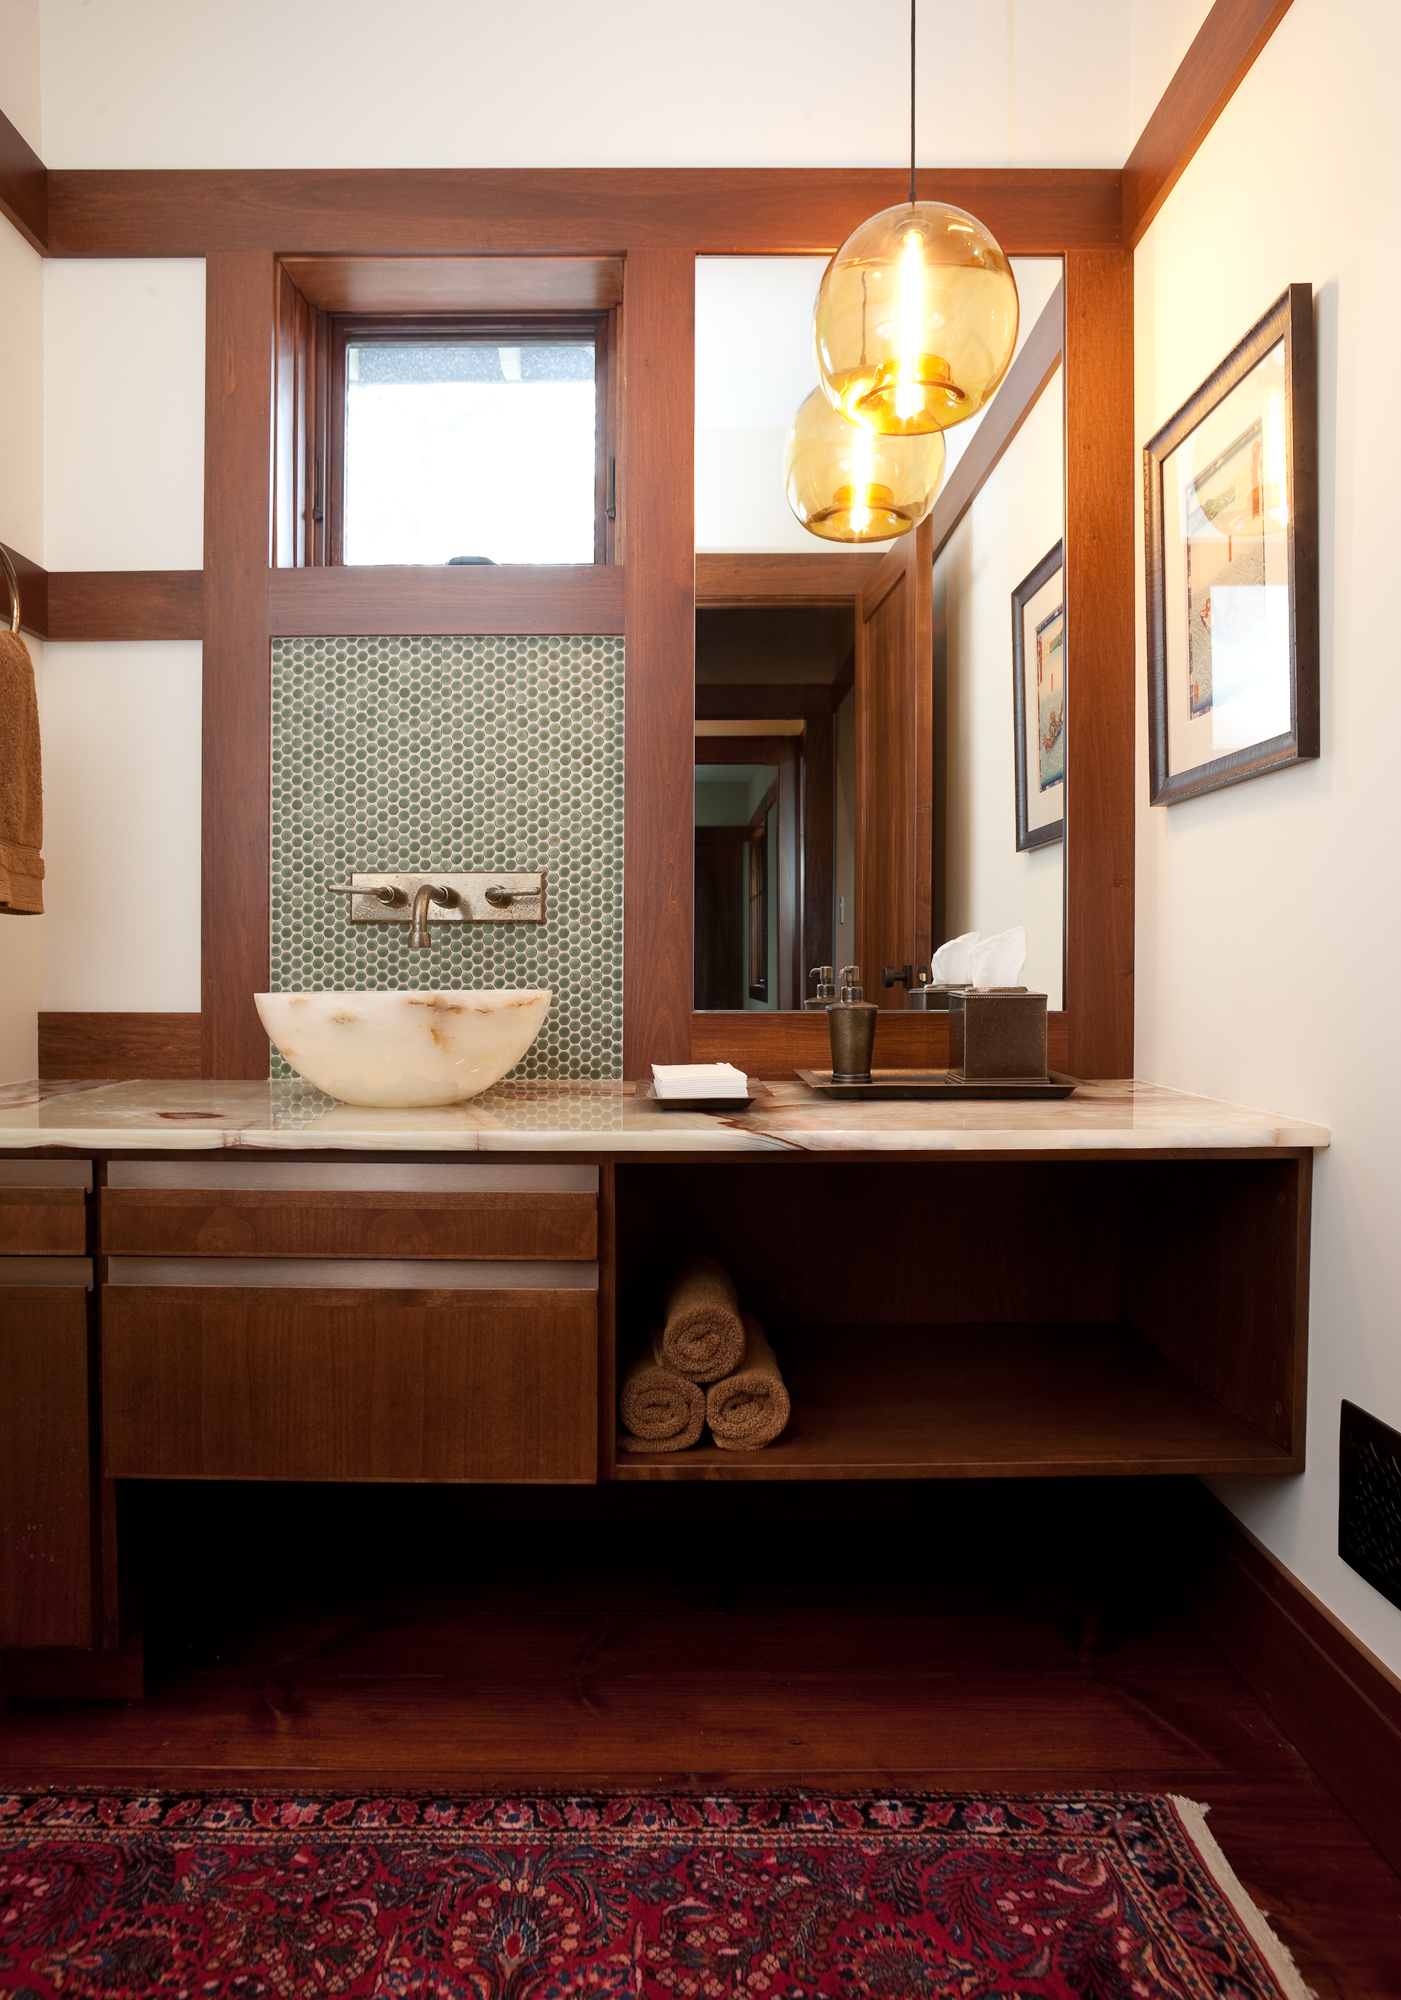 pharos and stamen pendants in residence on lake michigan amazing pendant lighting bathroom vanity